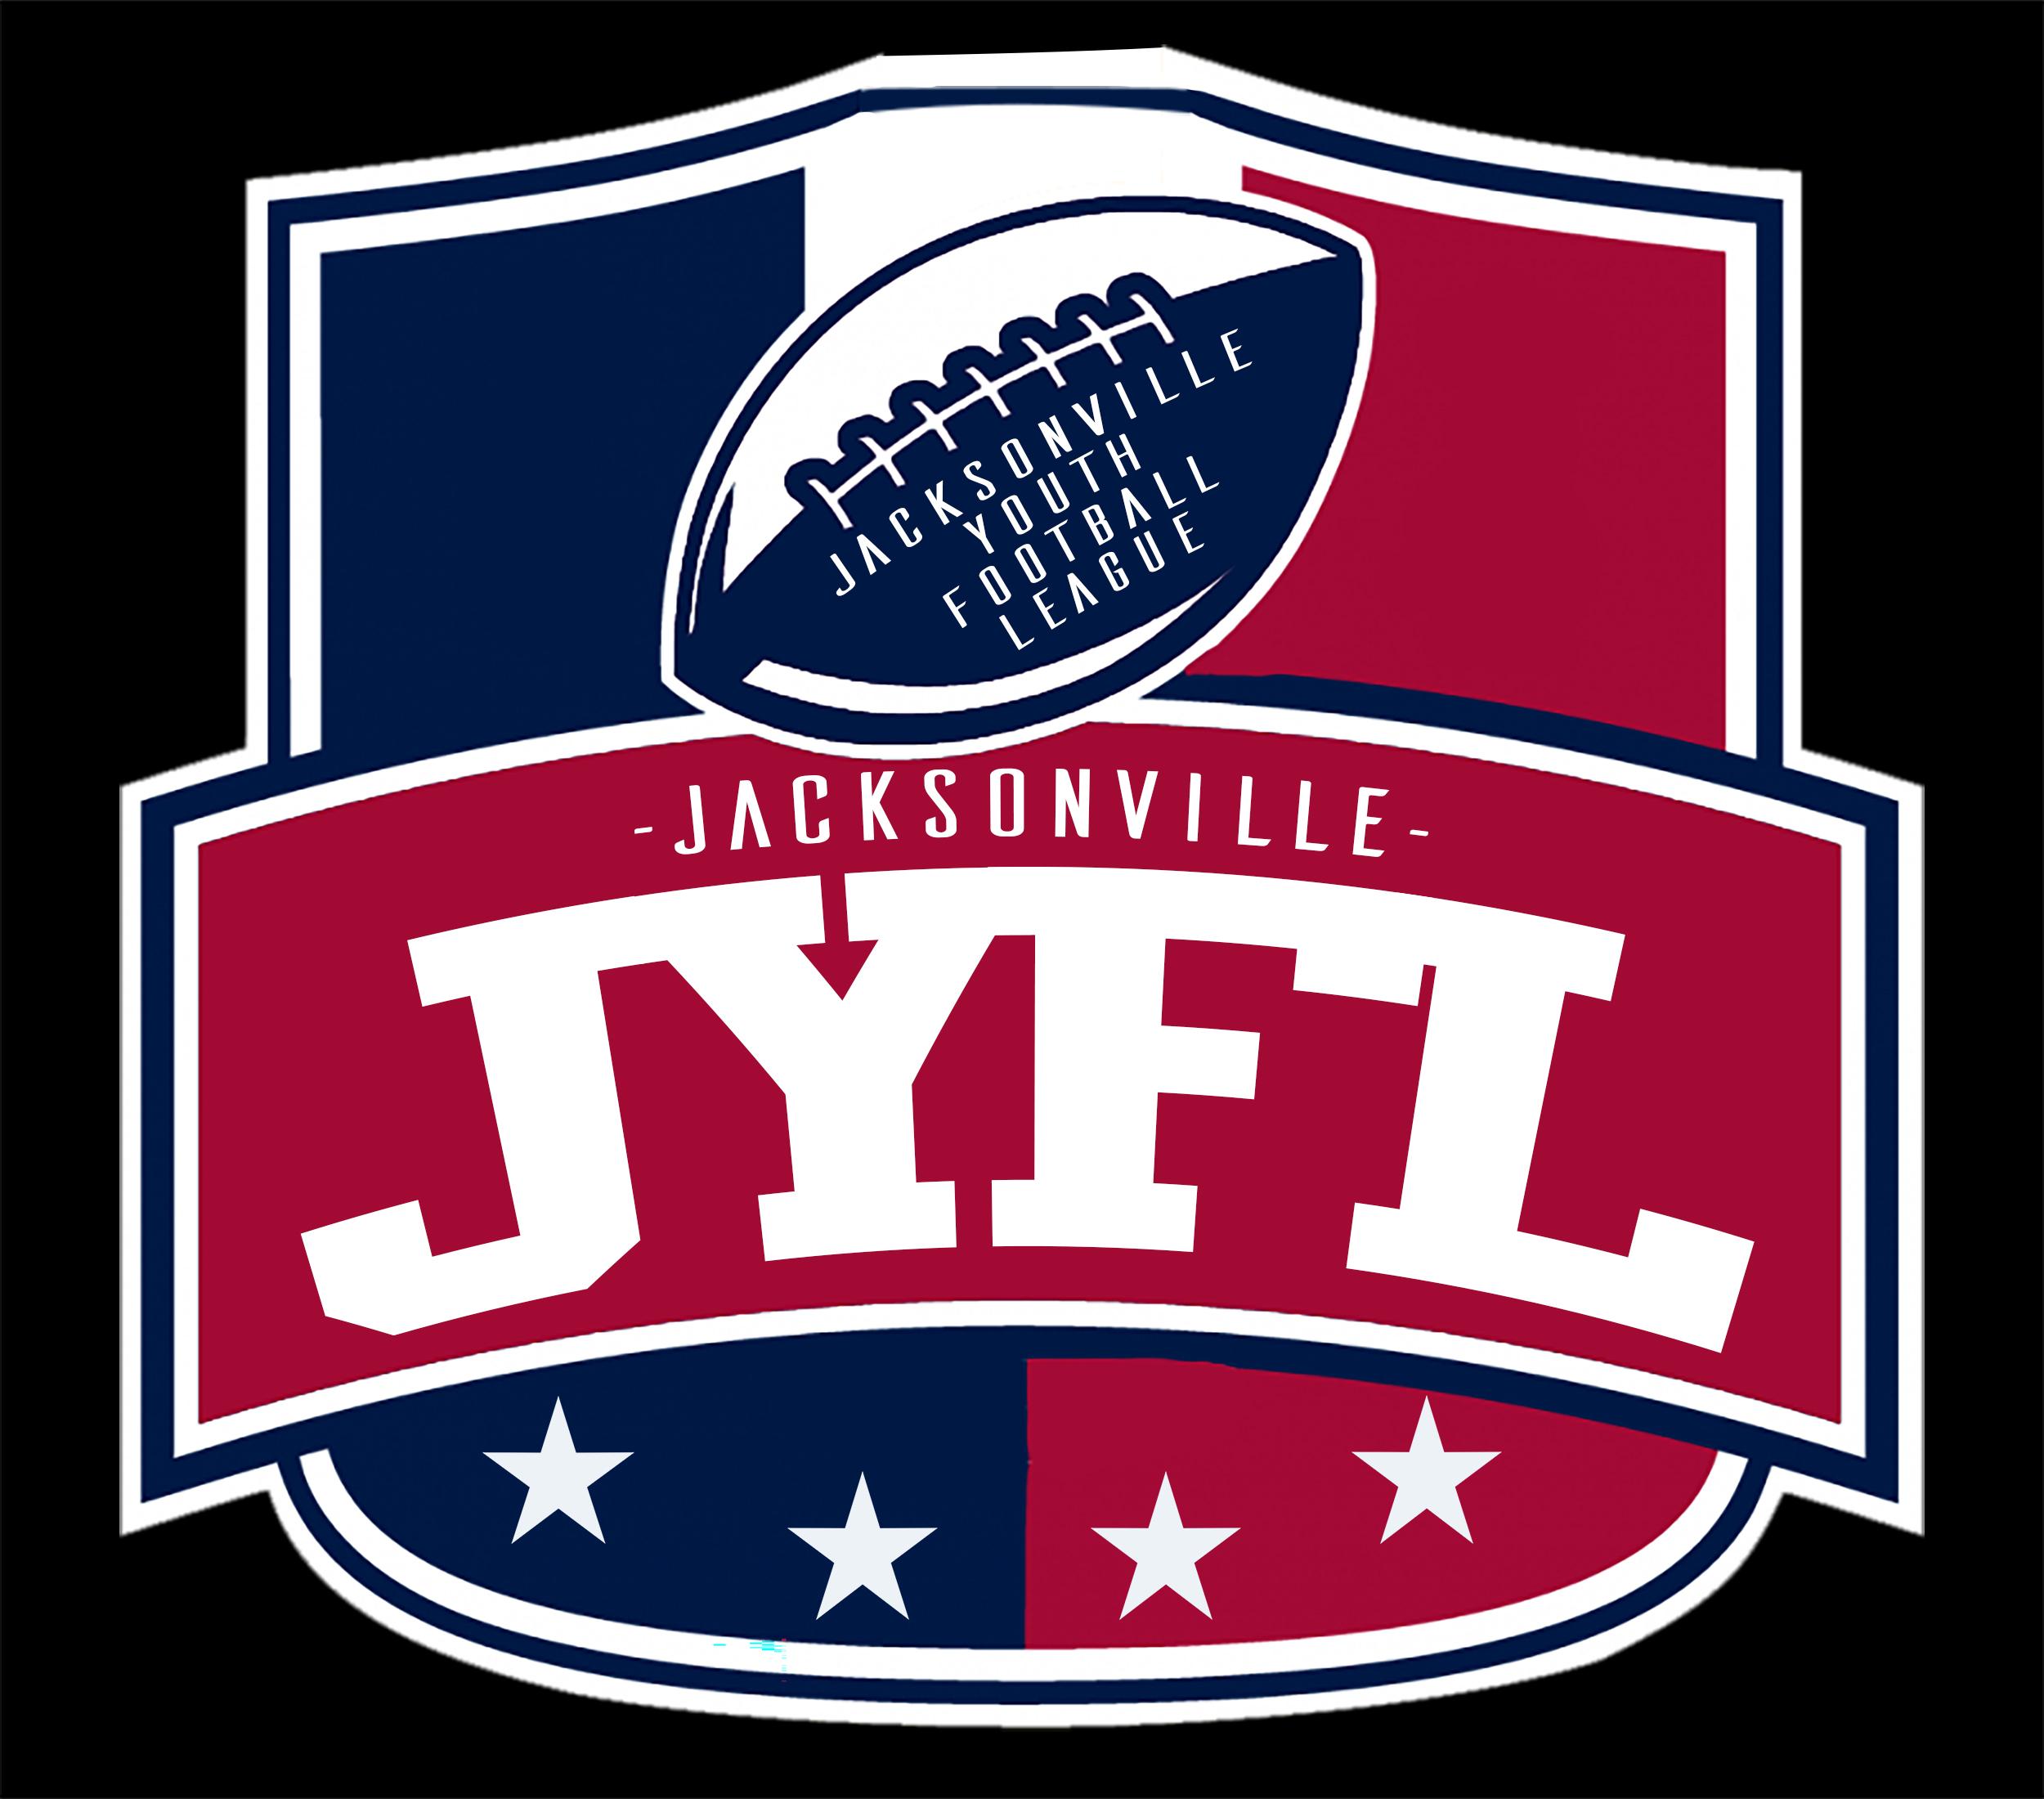 Jacksonville Youth Football League Inc. Logo